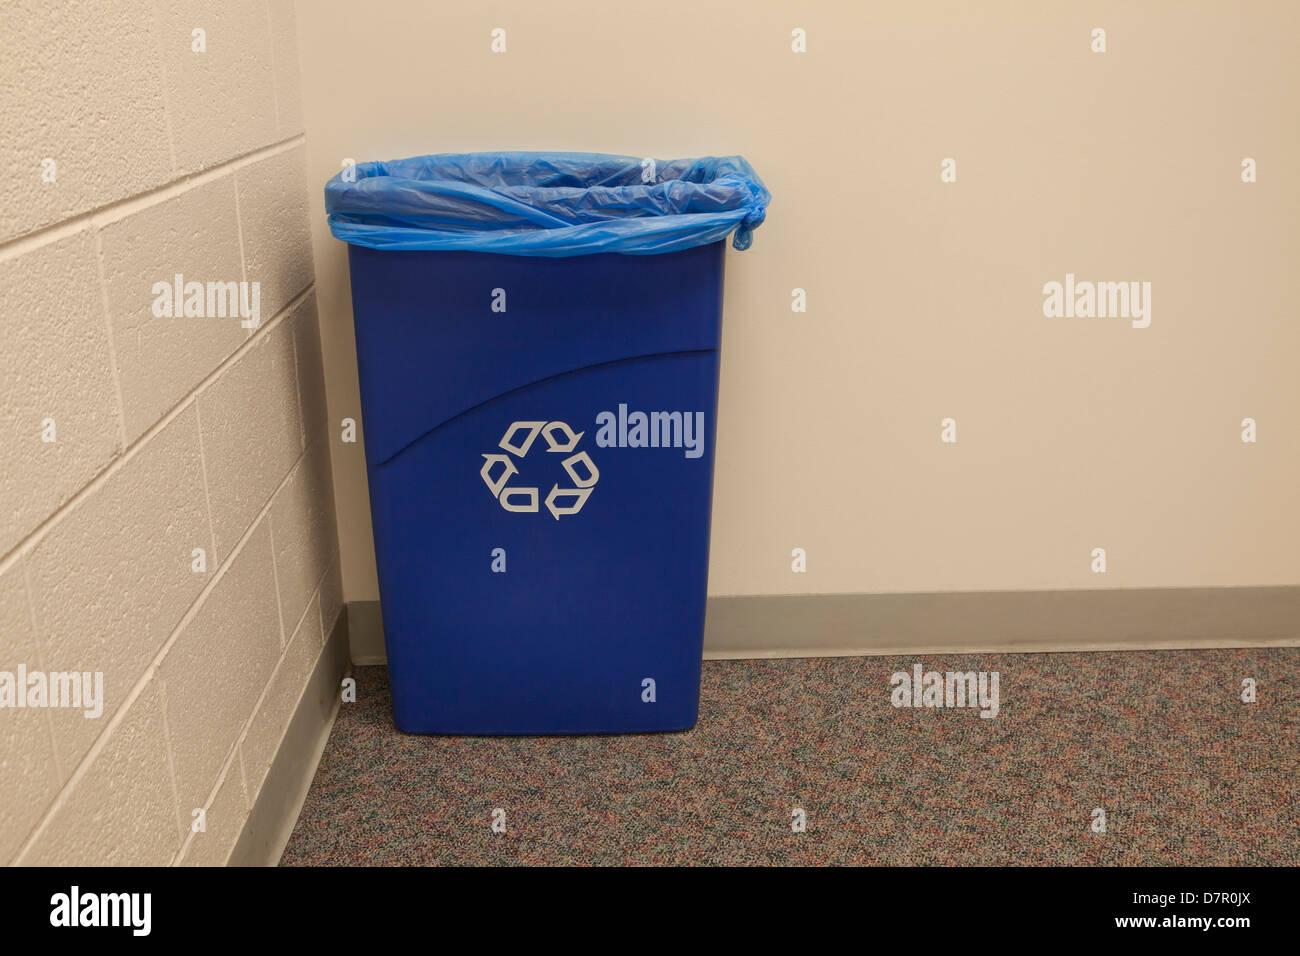 Office recycling bin - Stock Image